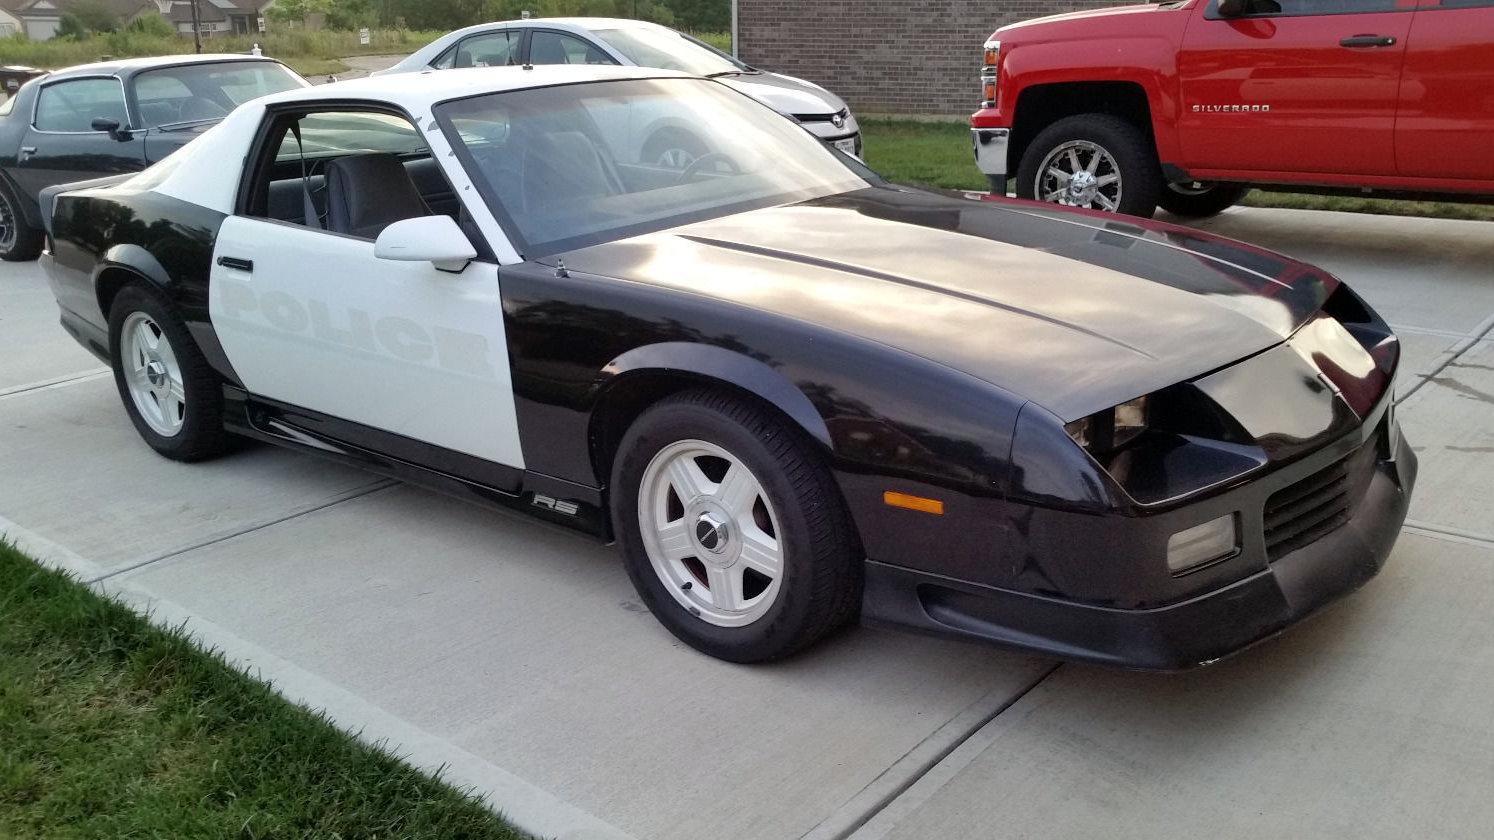 camaro 1991 b4c pursuit barnfinds chevrolet ultimate cars z28 police